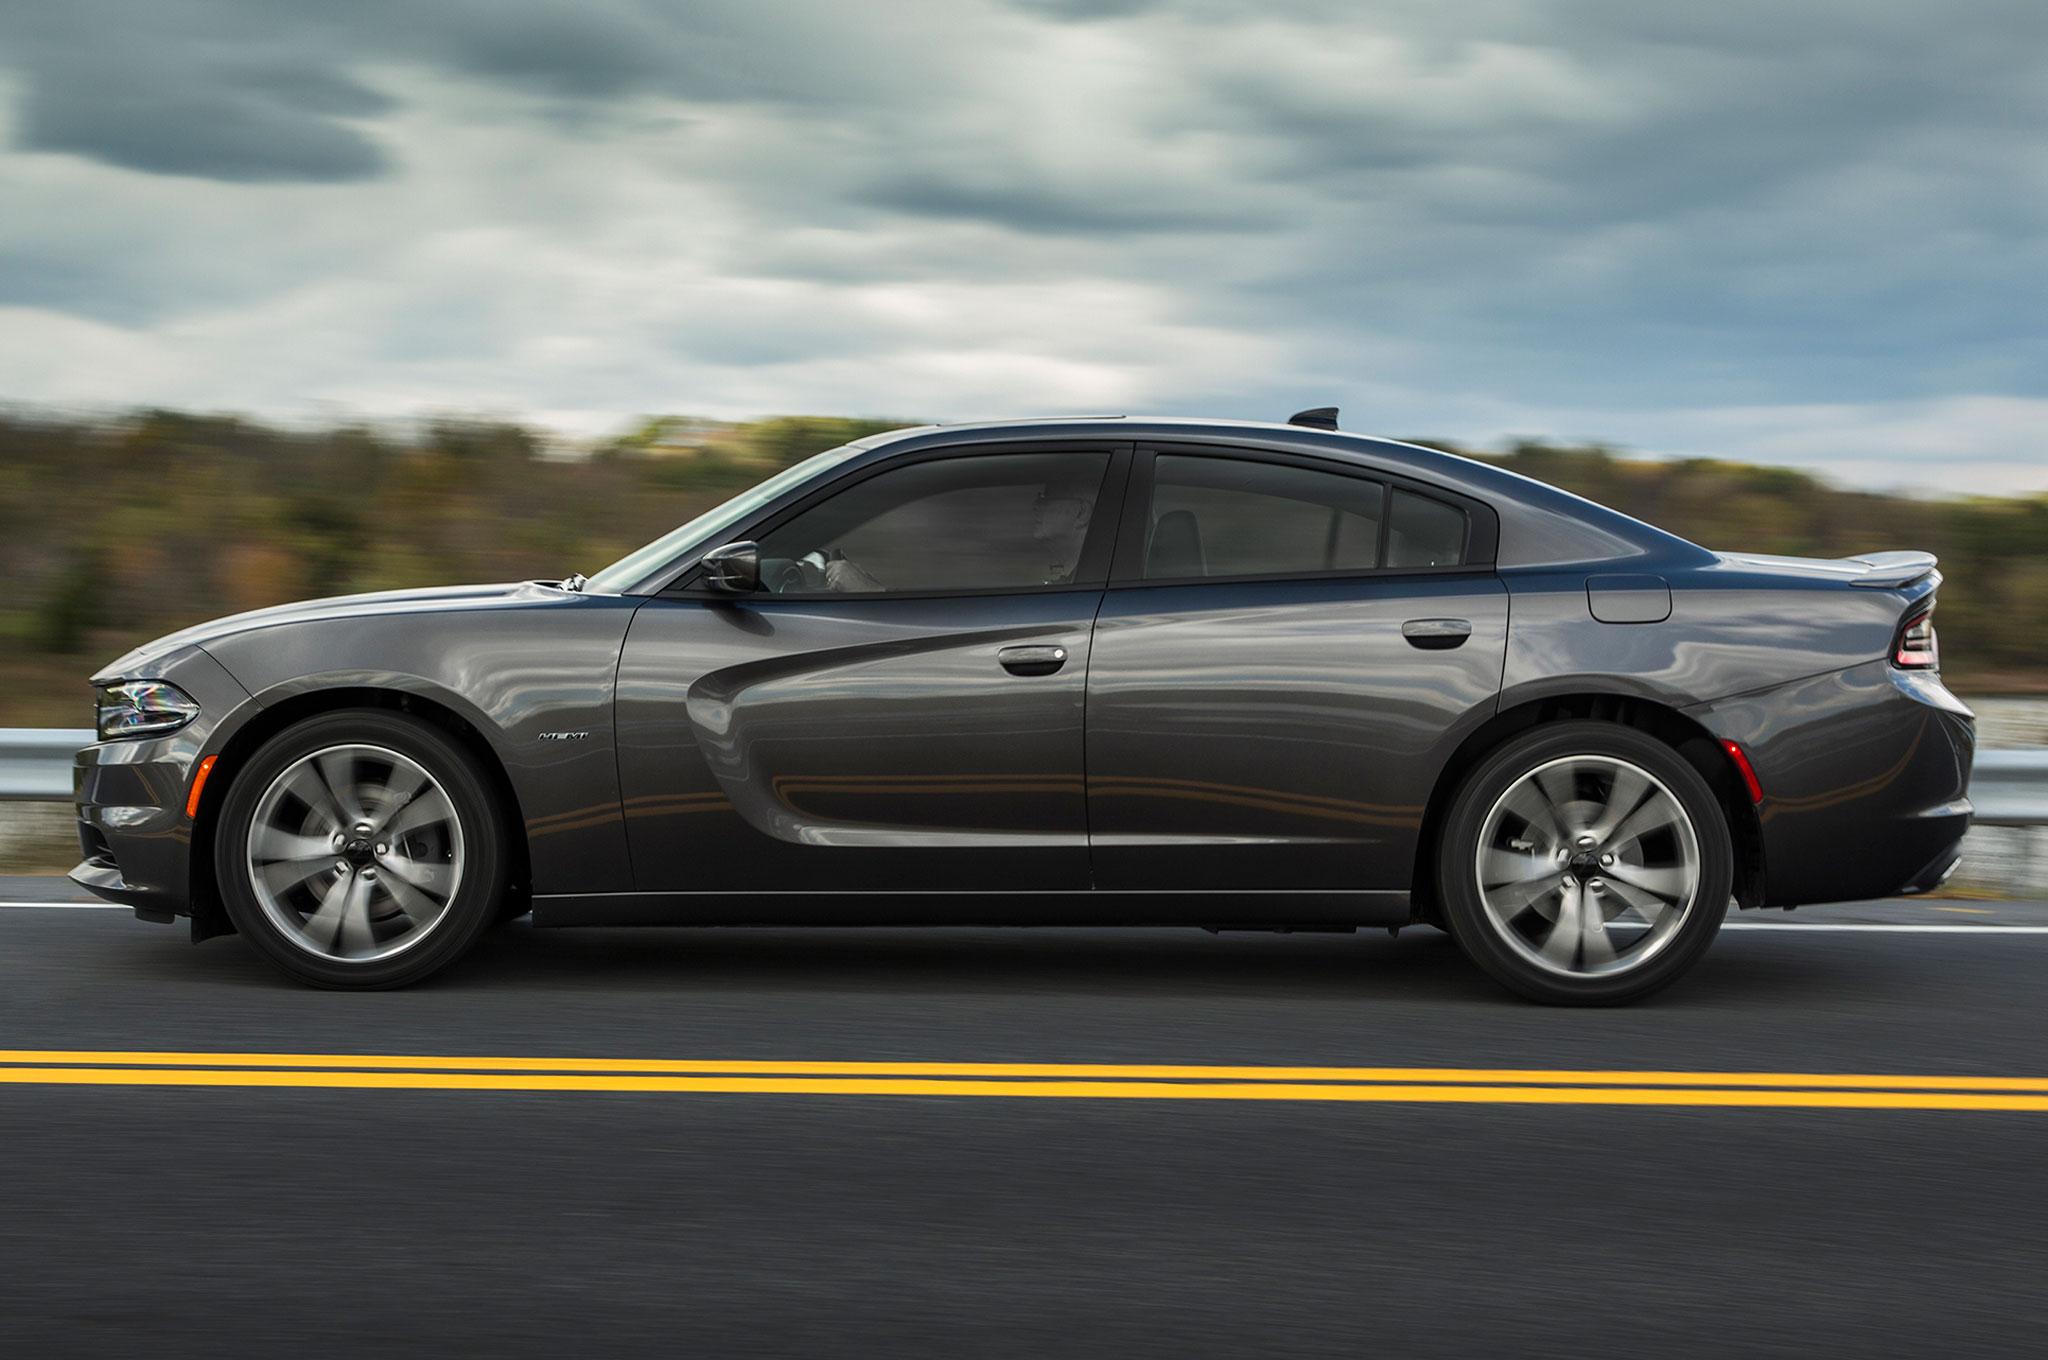 Mopar Launches Limited Edition 2015 Dodge Charger R T